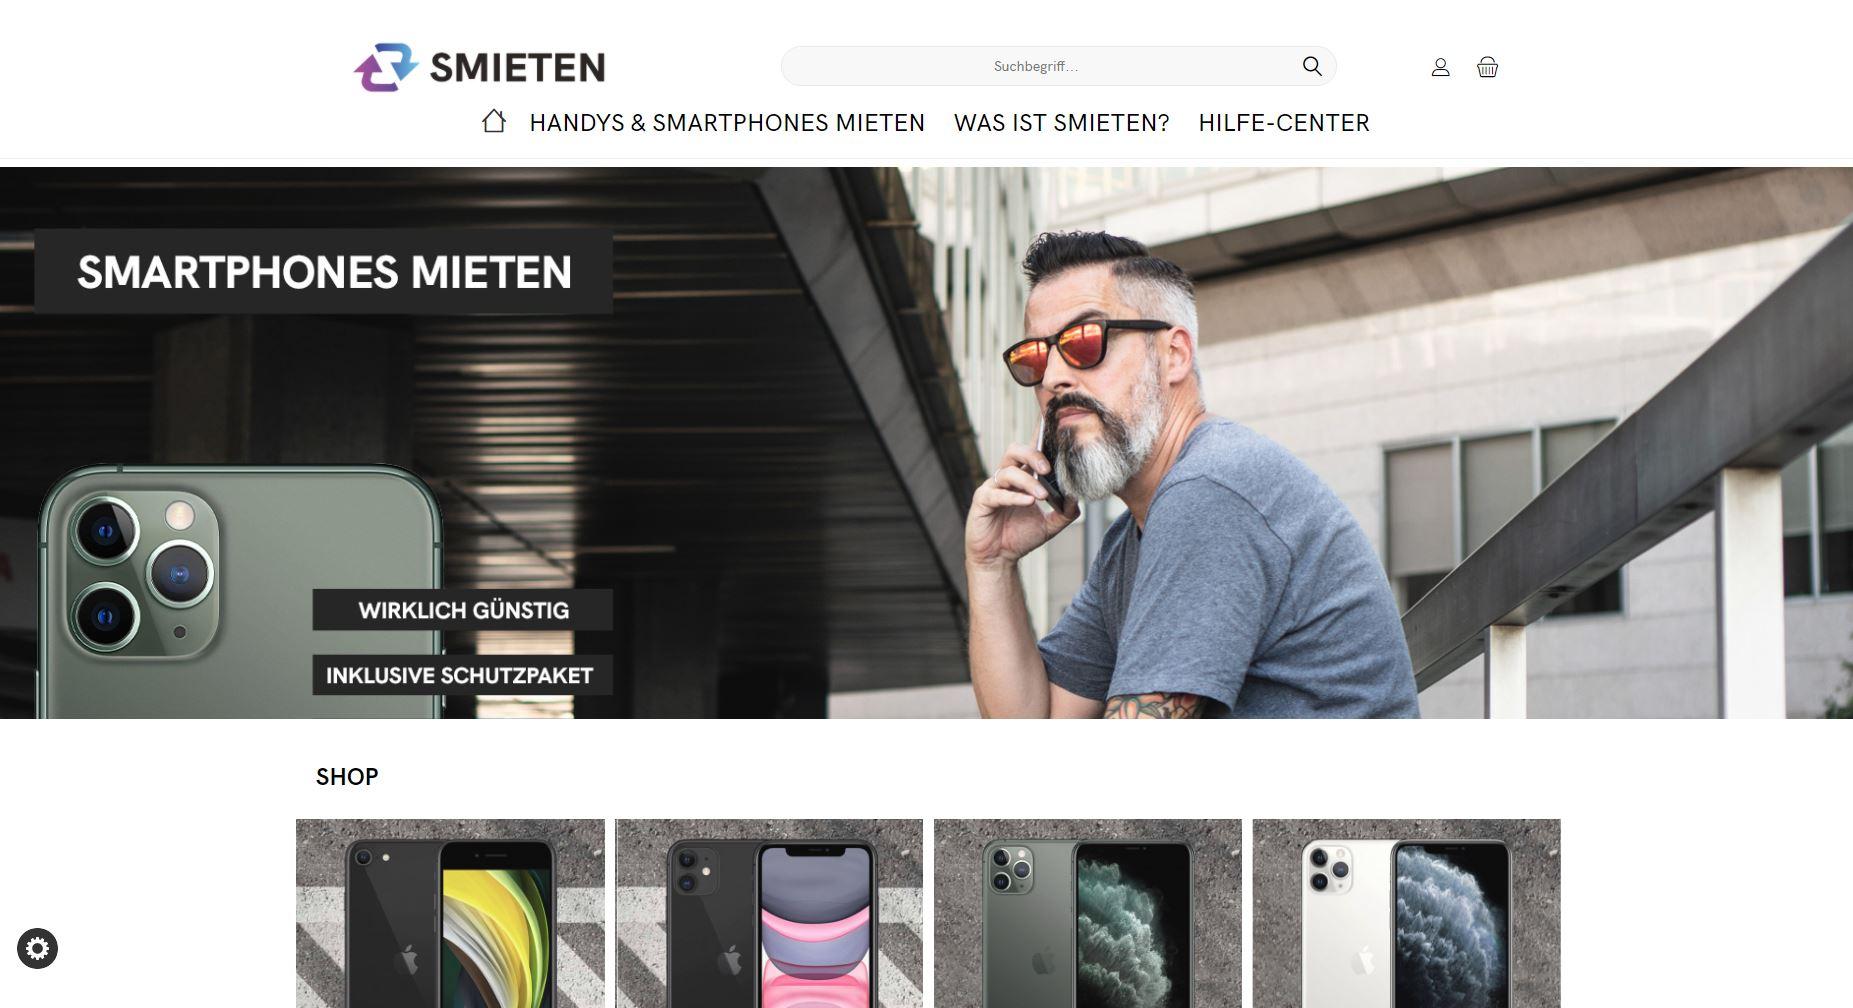 Smieten GmbH